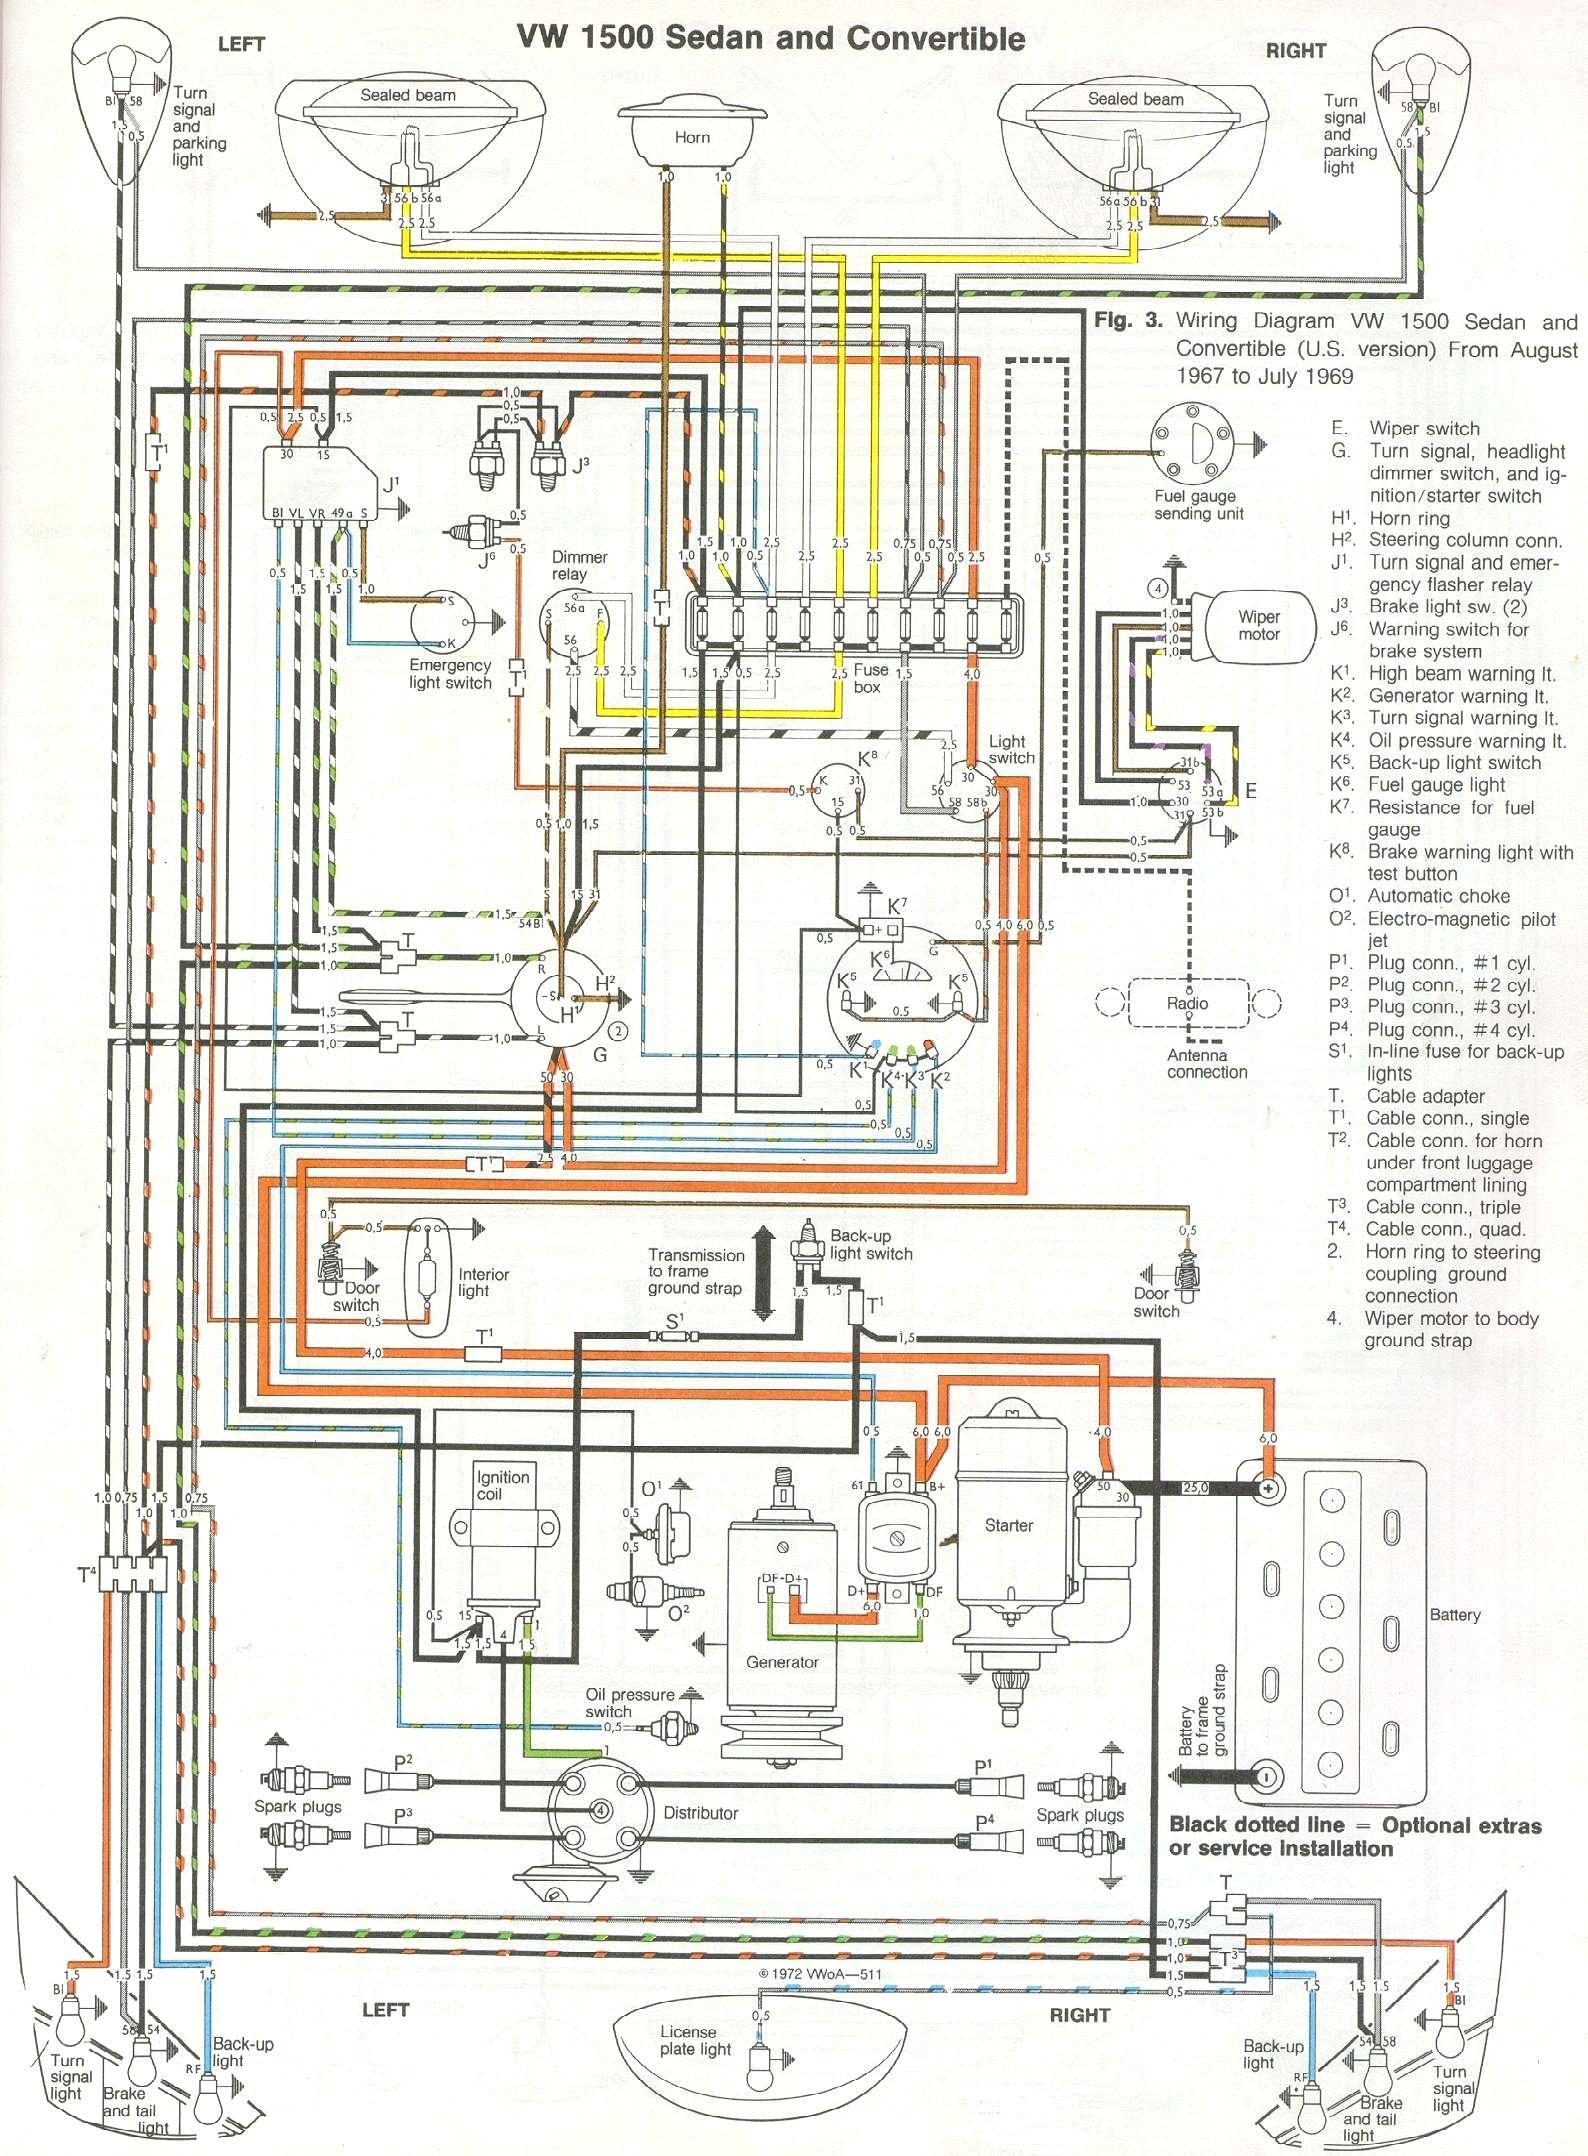 1967 Jeep Wiring Diagram Hyundai 3 8l V6 Engine Diagram For Wiring Diagram Schematics